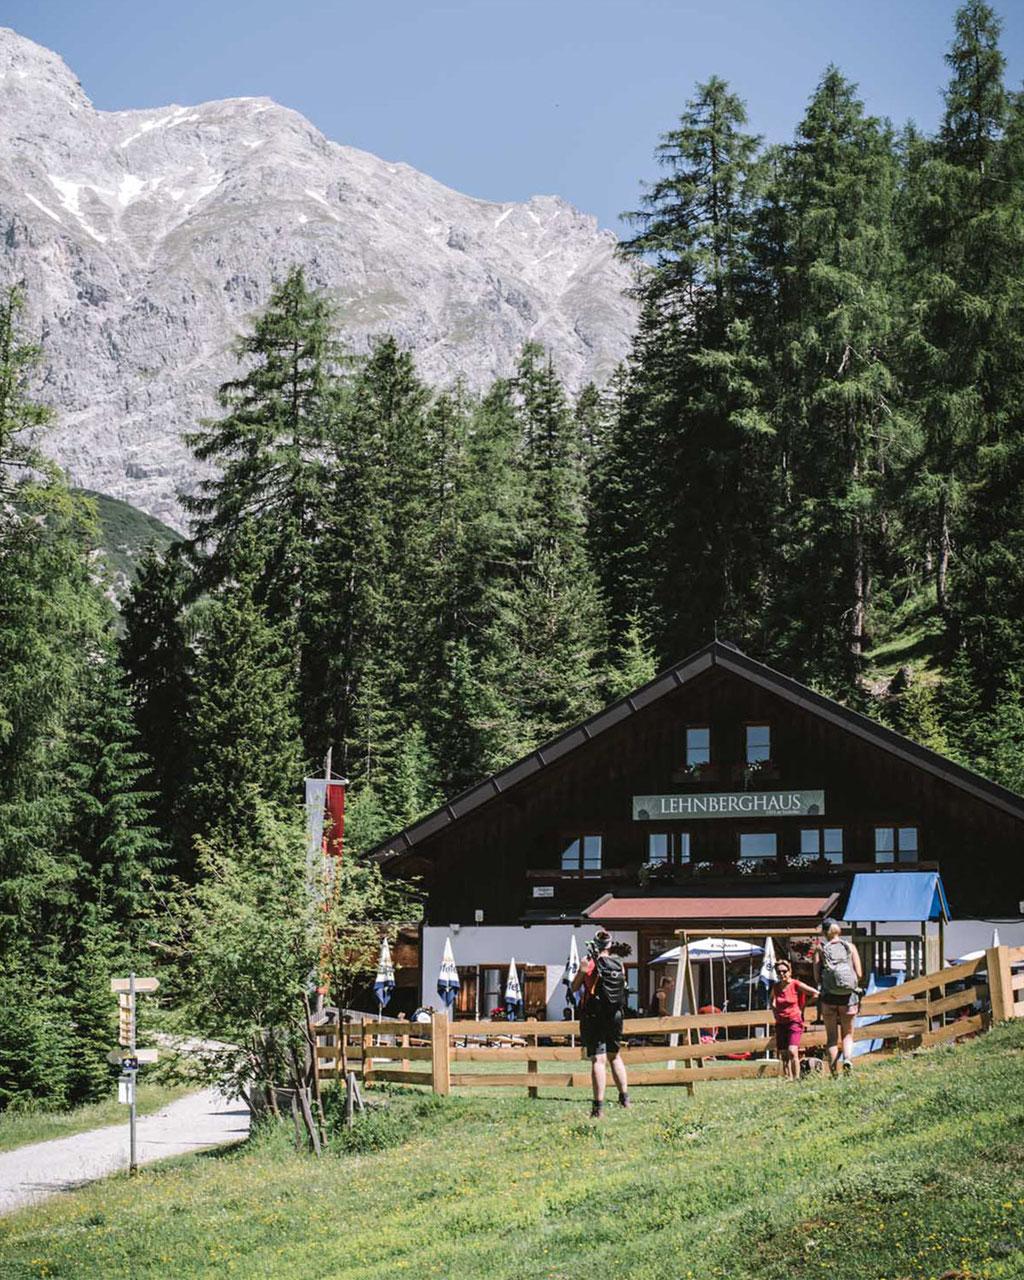 Innsbrucktrek: Mieminger Plateau, Lehnberghaus, Lacke